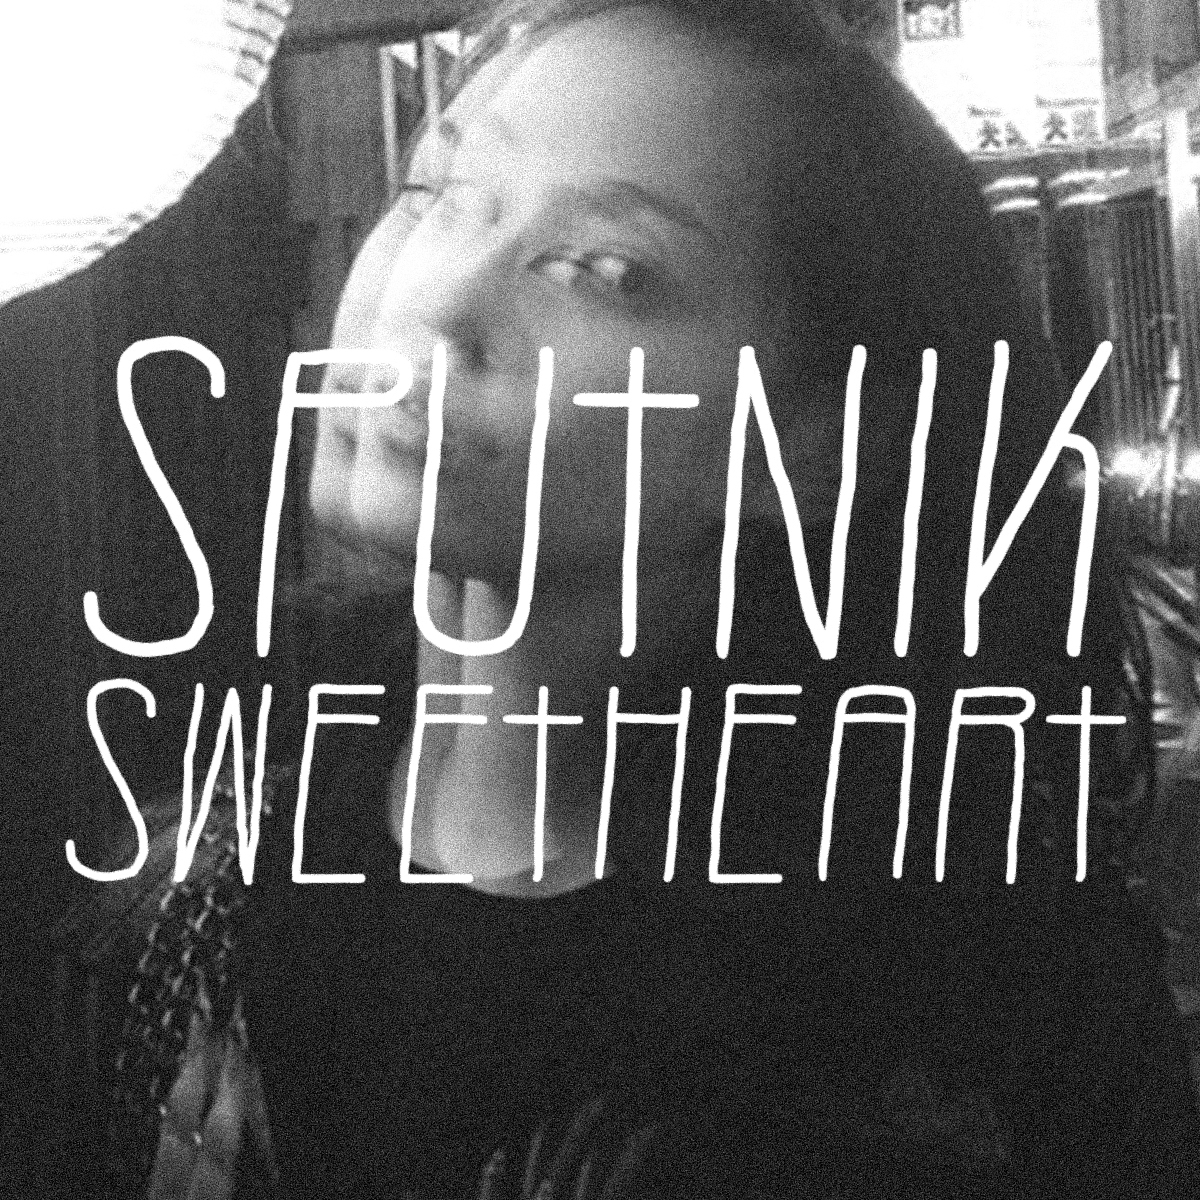 sputnick-.jpg